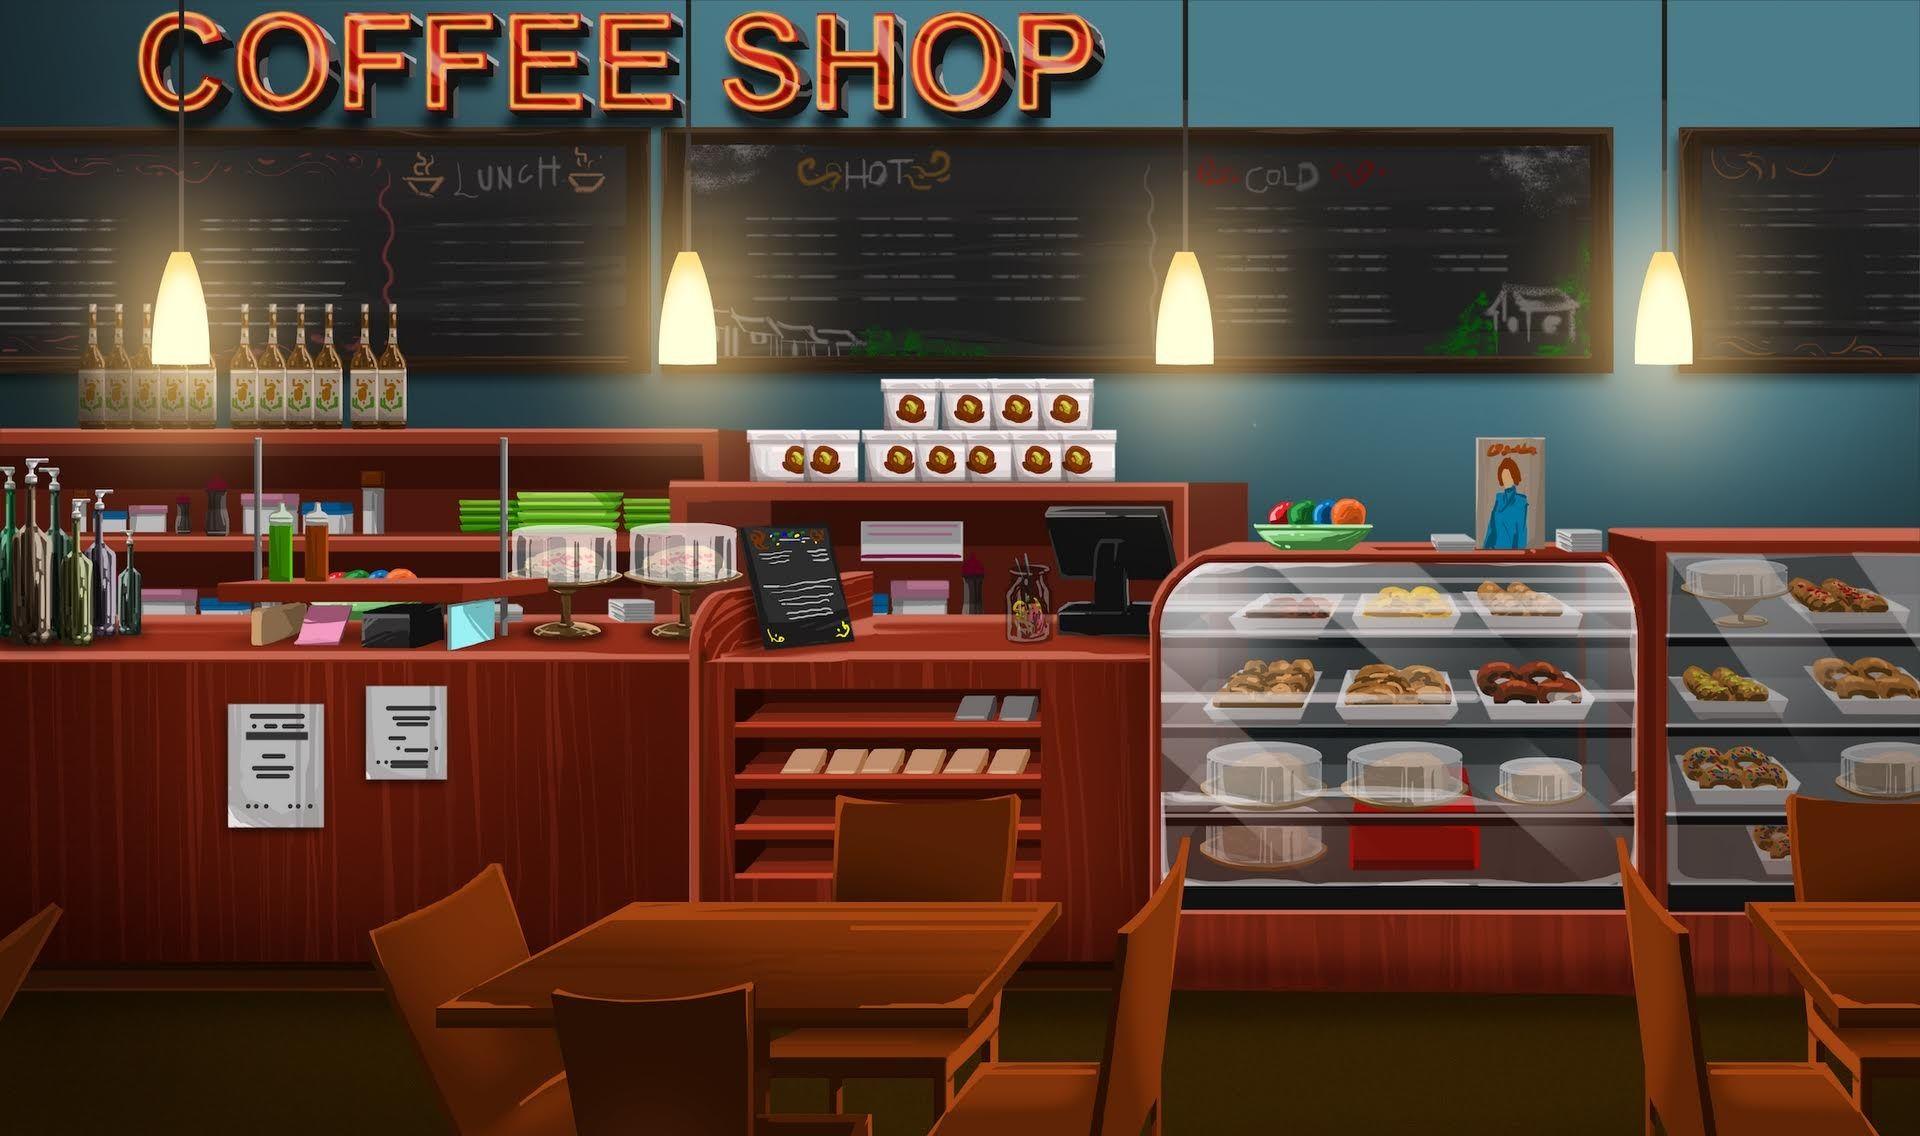 INT. COFFEE SHOP LARGE EpisodeInteractive Episode Size